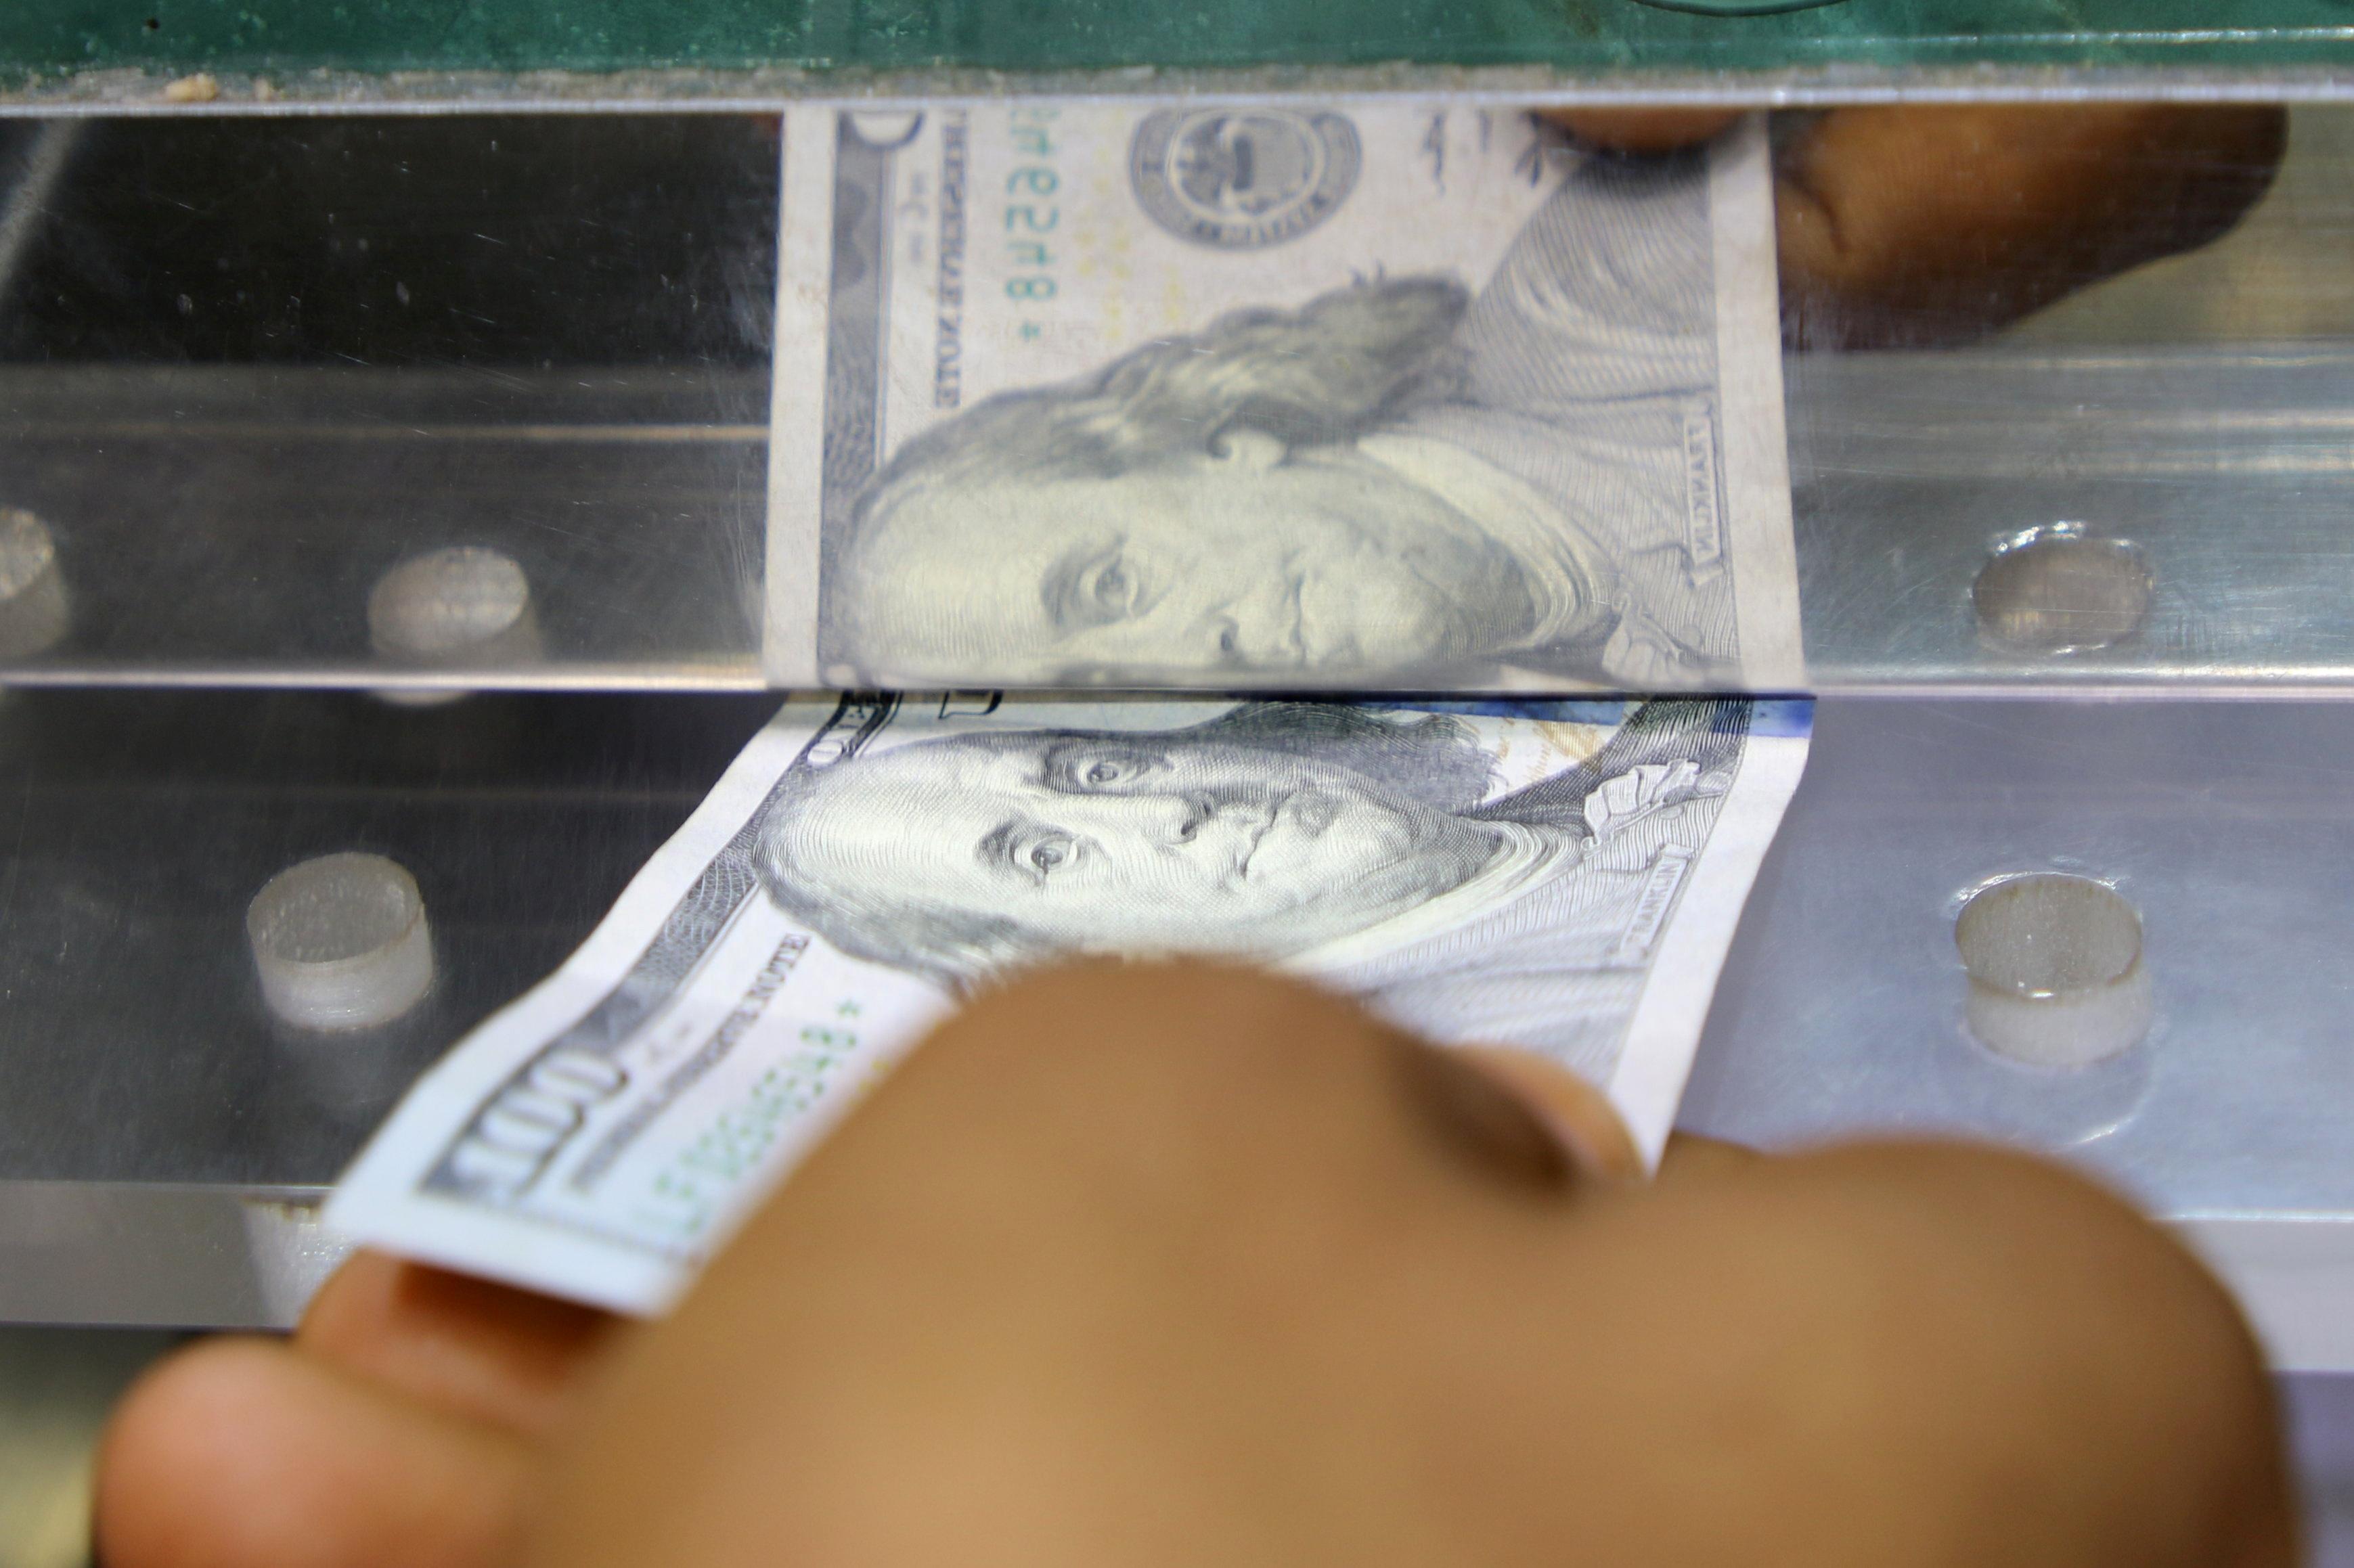 A man inserts a U.S. dollar banknote into the window of a local currency exchange in Aden, Yemen June 29, 2021.  REUTERS/Fawaz Salman